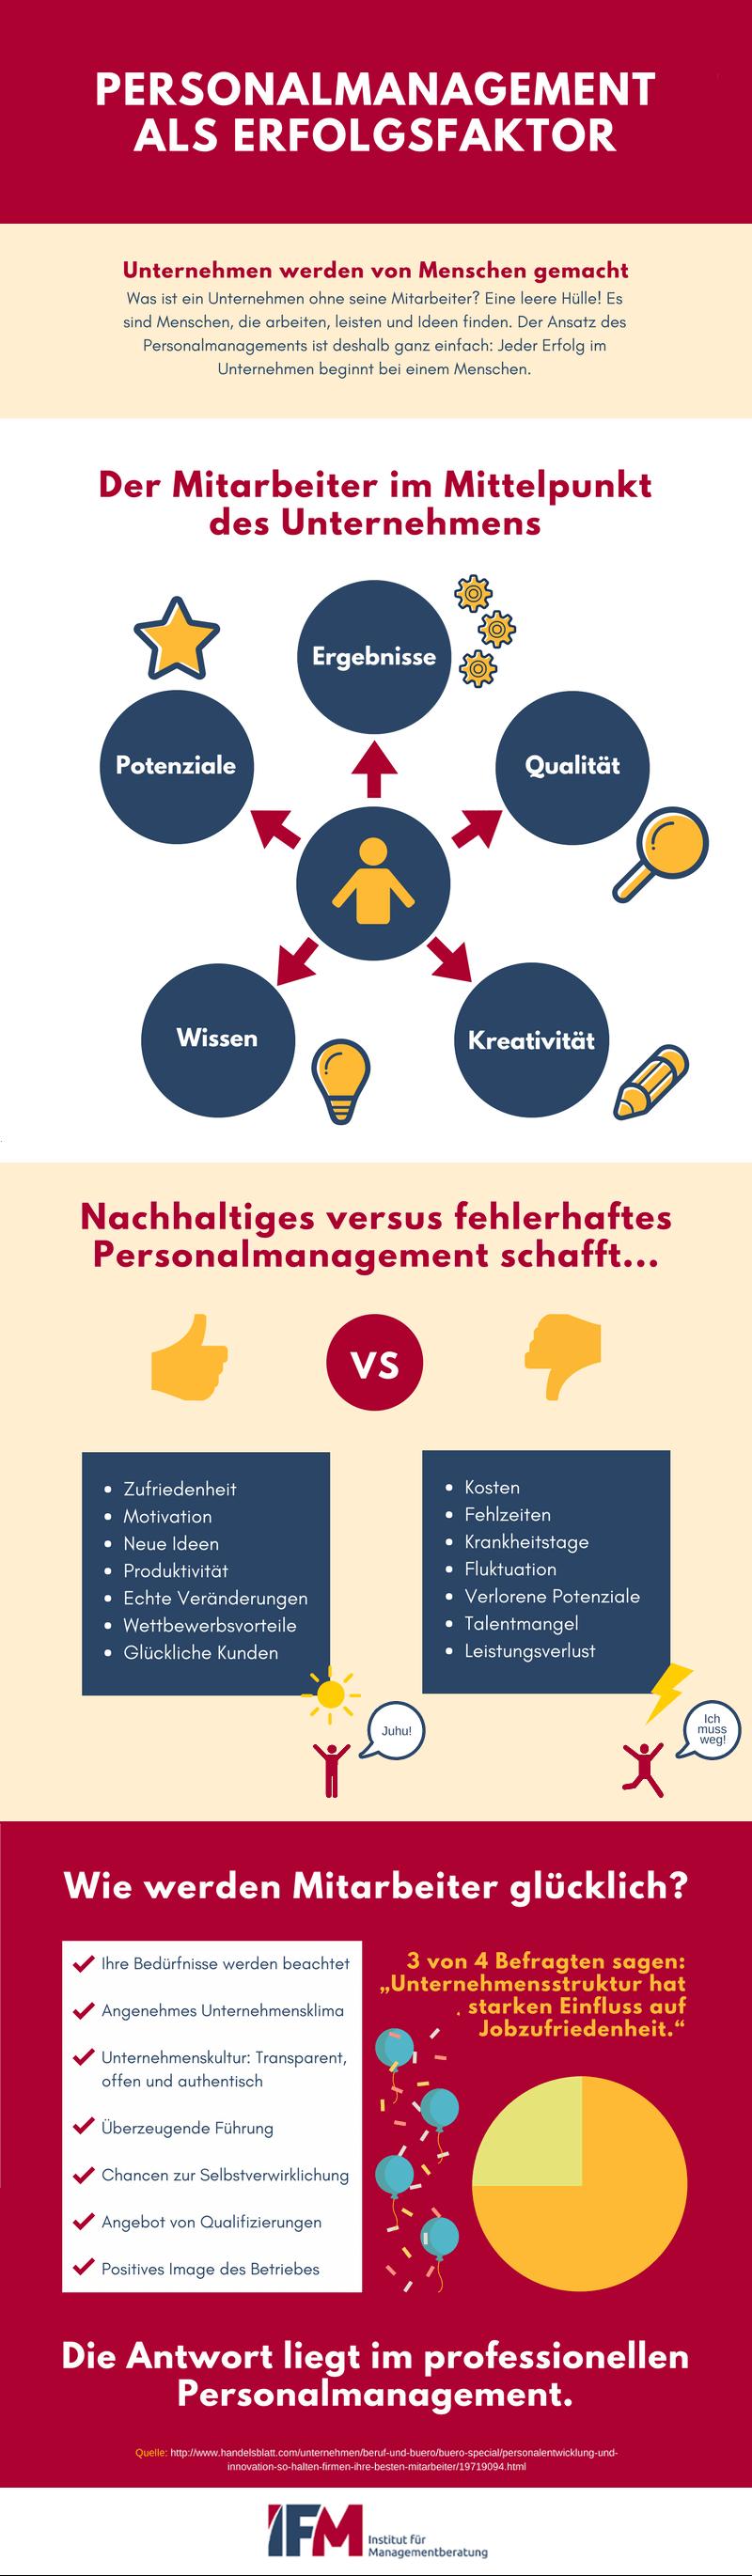 Infografik zum Thema Personalmanagement als Erfolgsfaktor